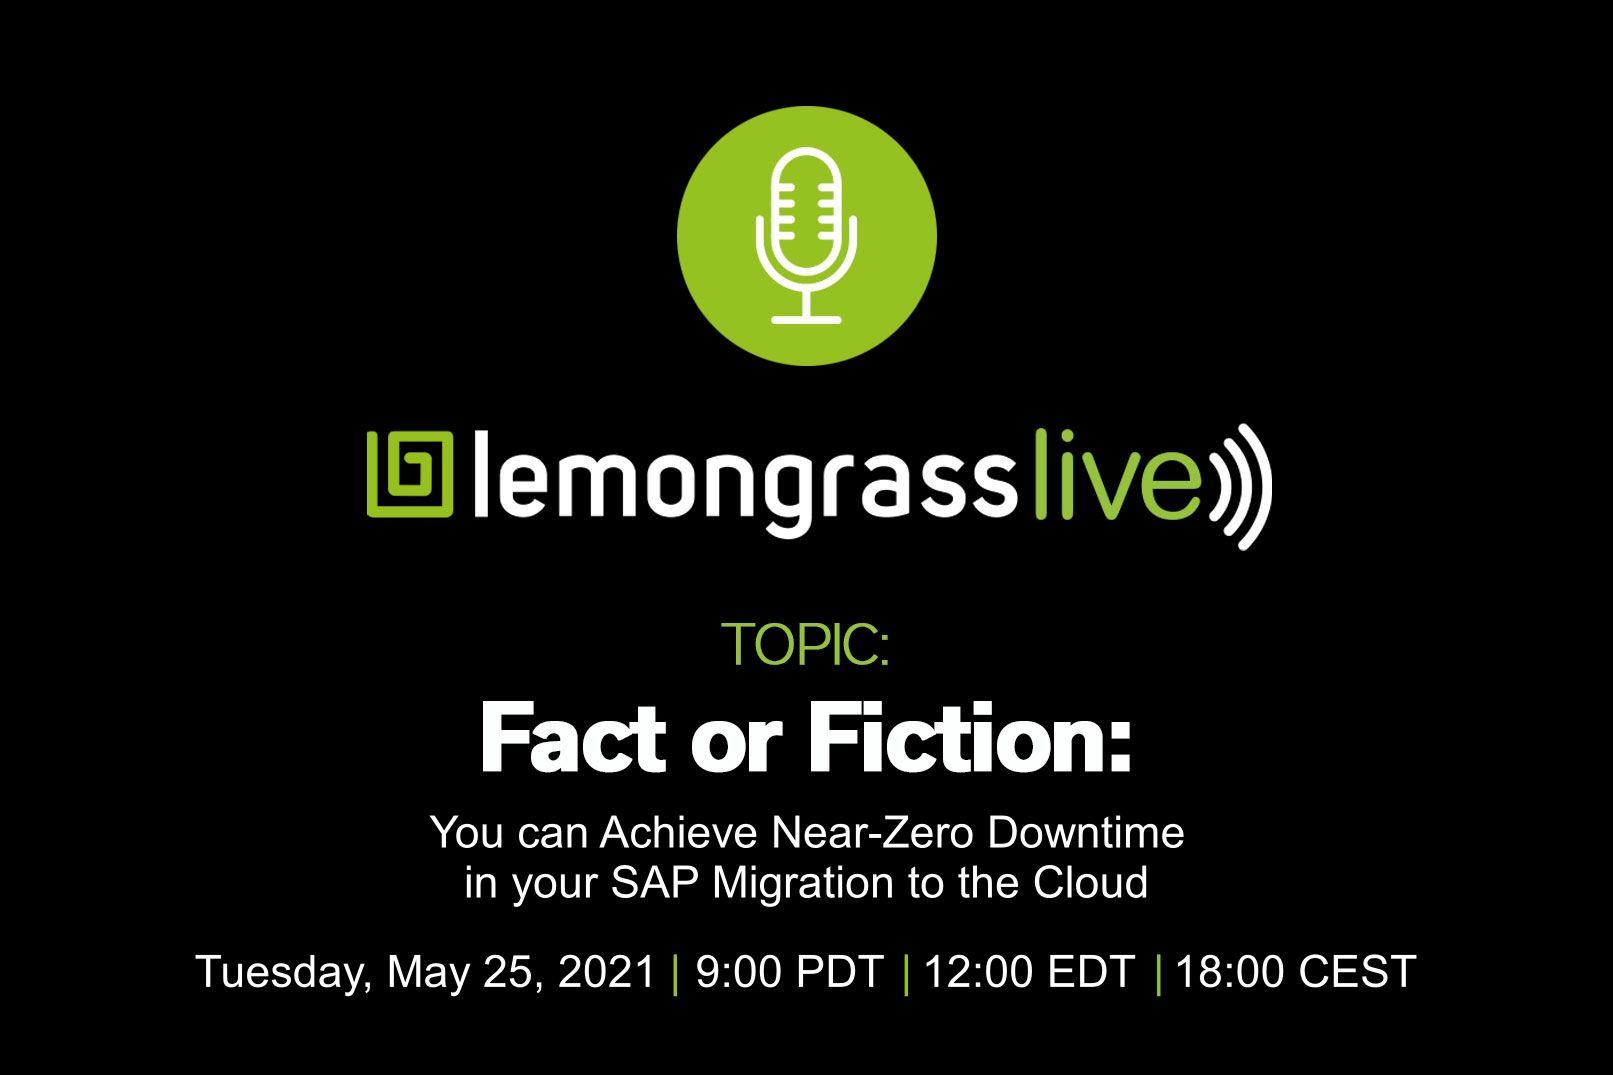 Lemongrass Live - near zero downtime SAP migration